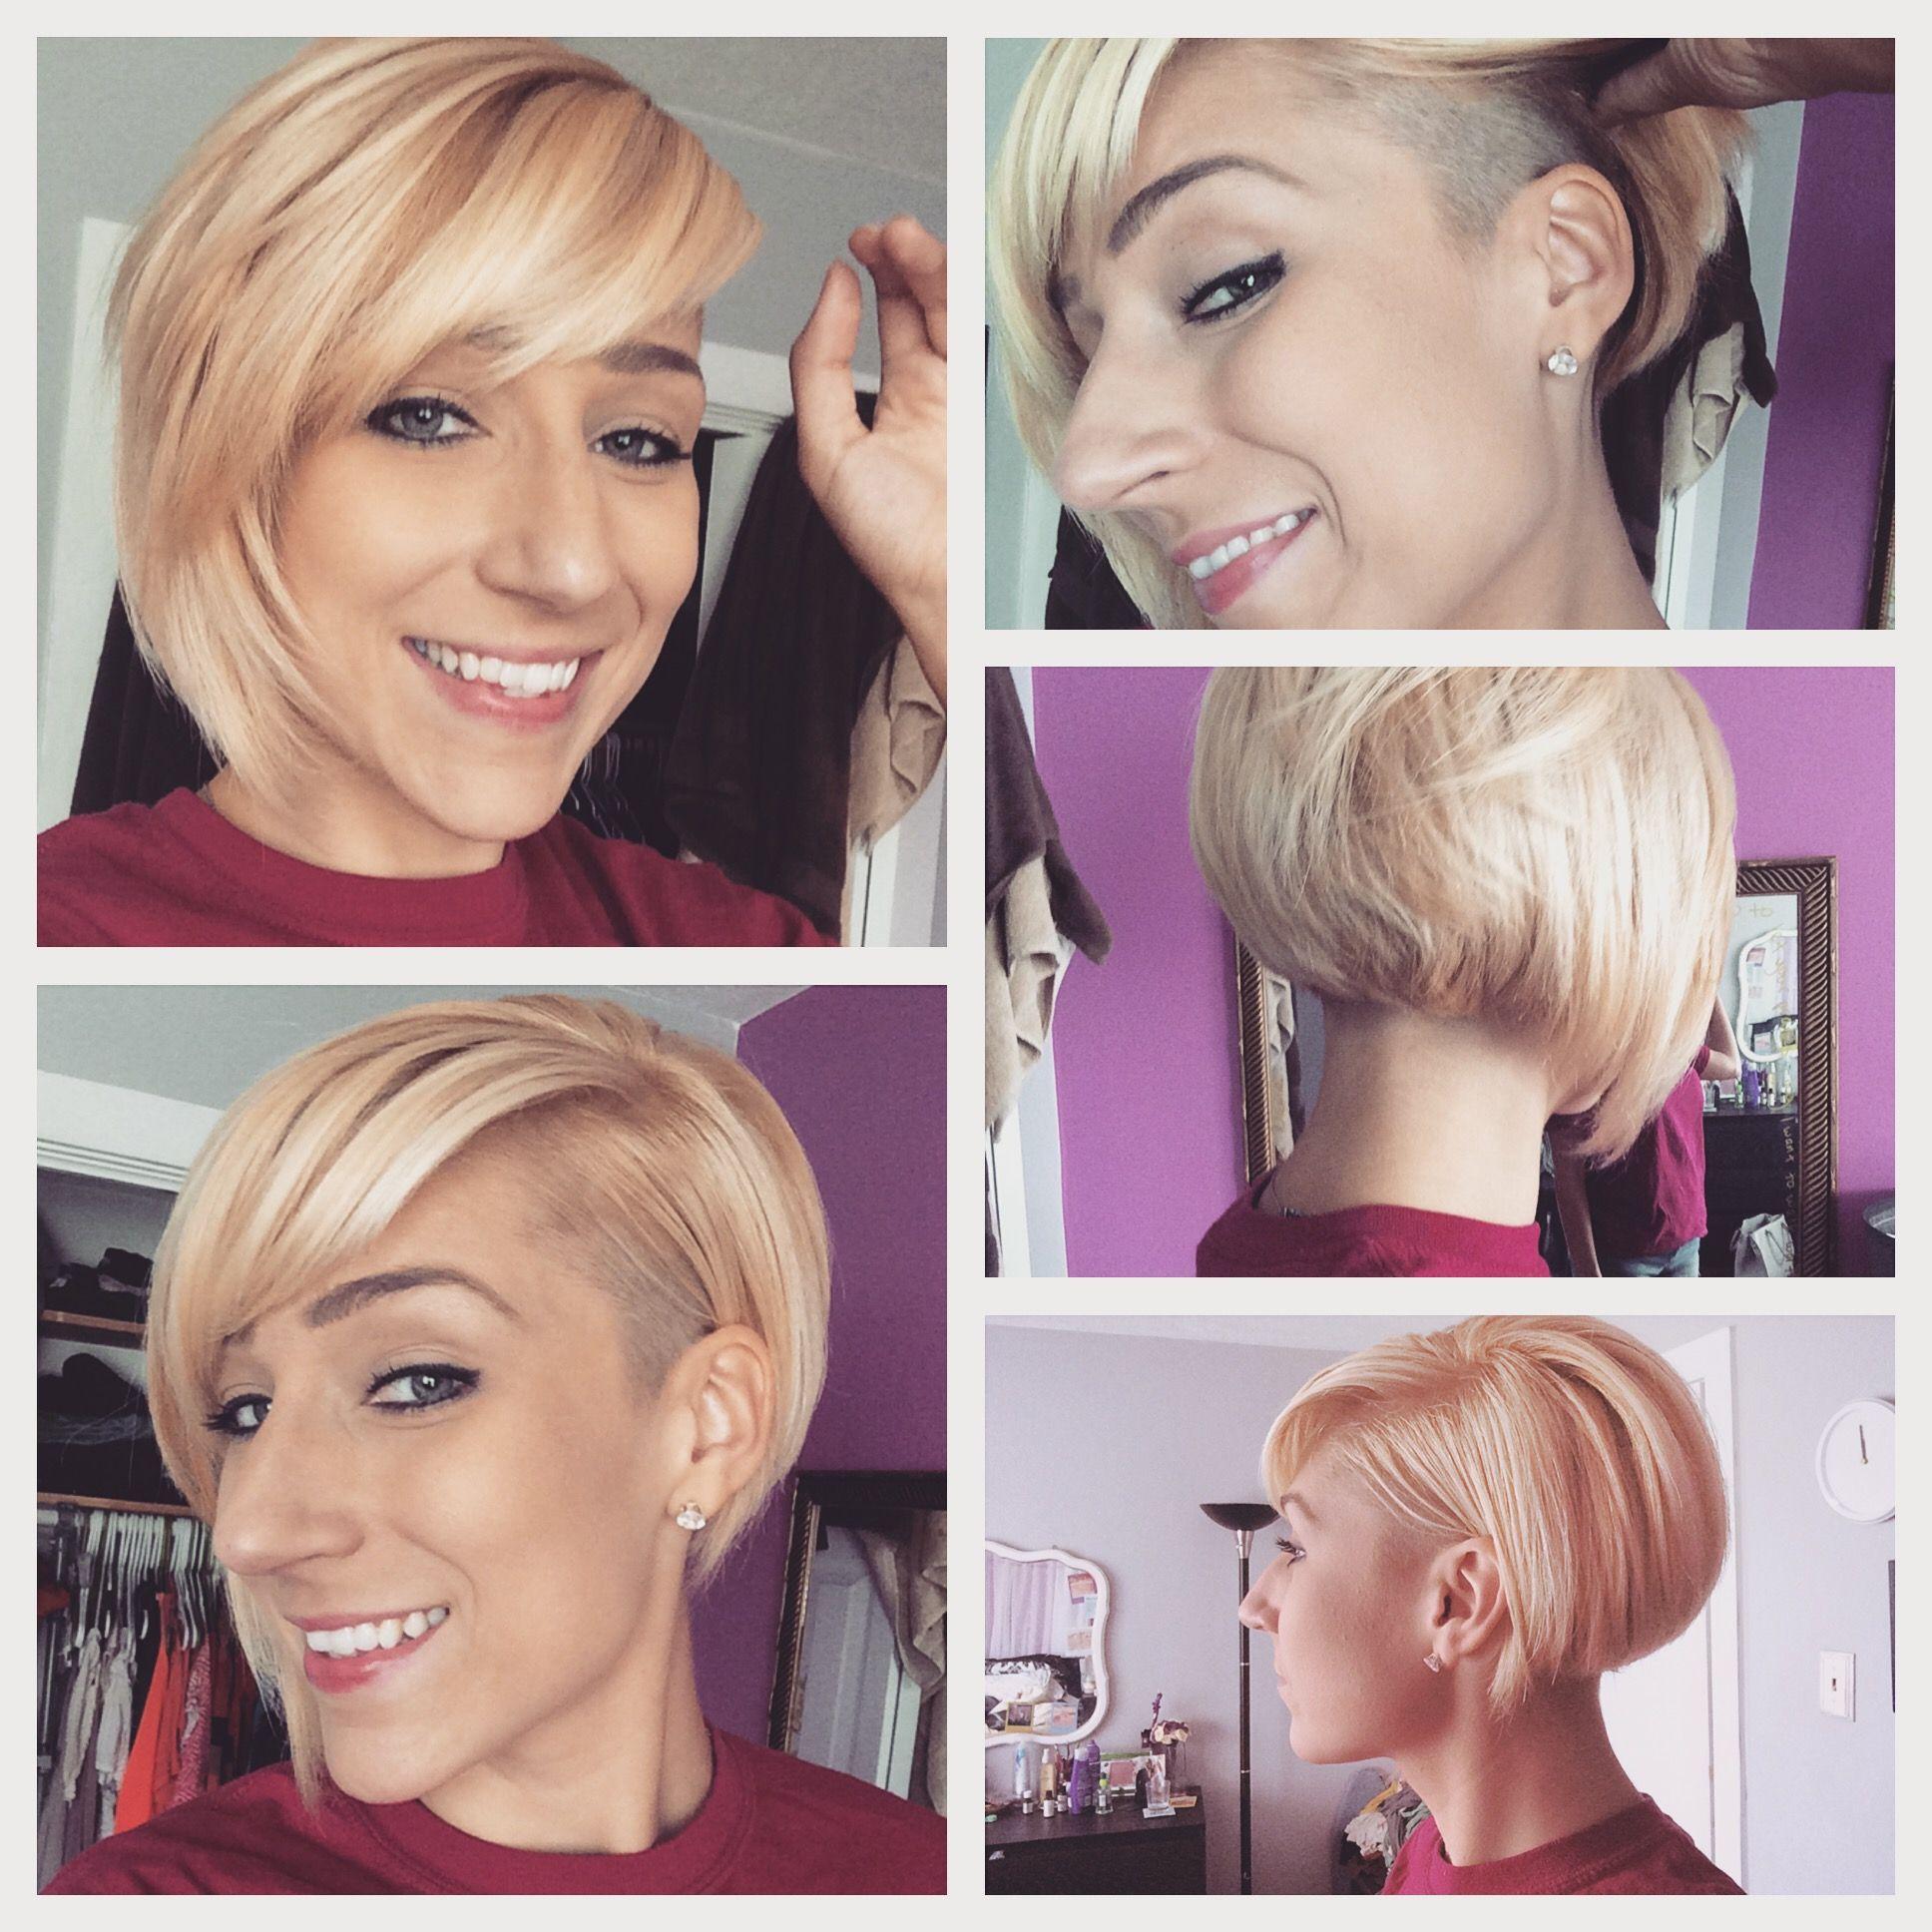 Side shave asymmetrical bob for thick hair | Bob hairstyles for thick, Thick hair styles, Happy hair